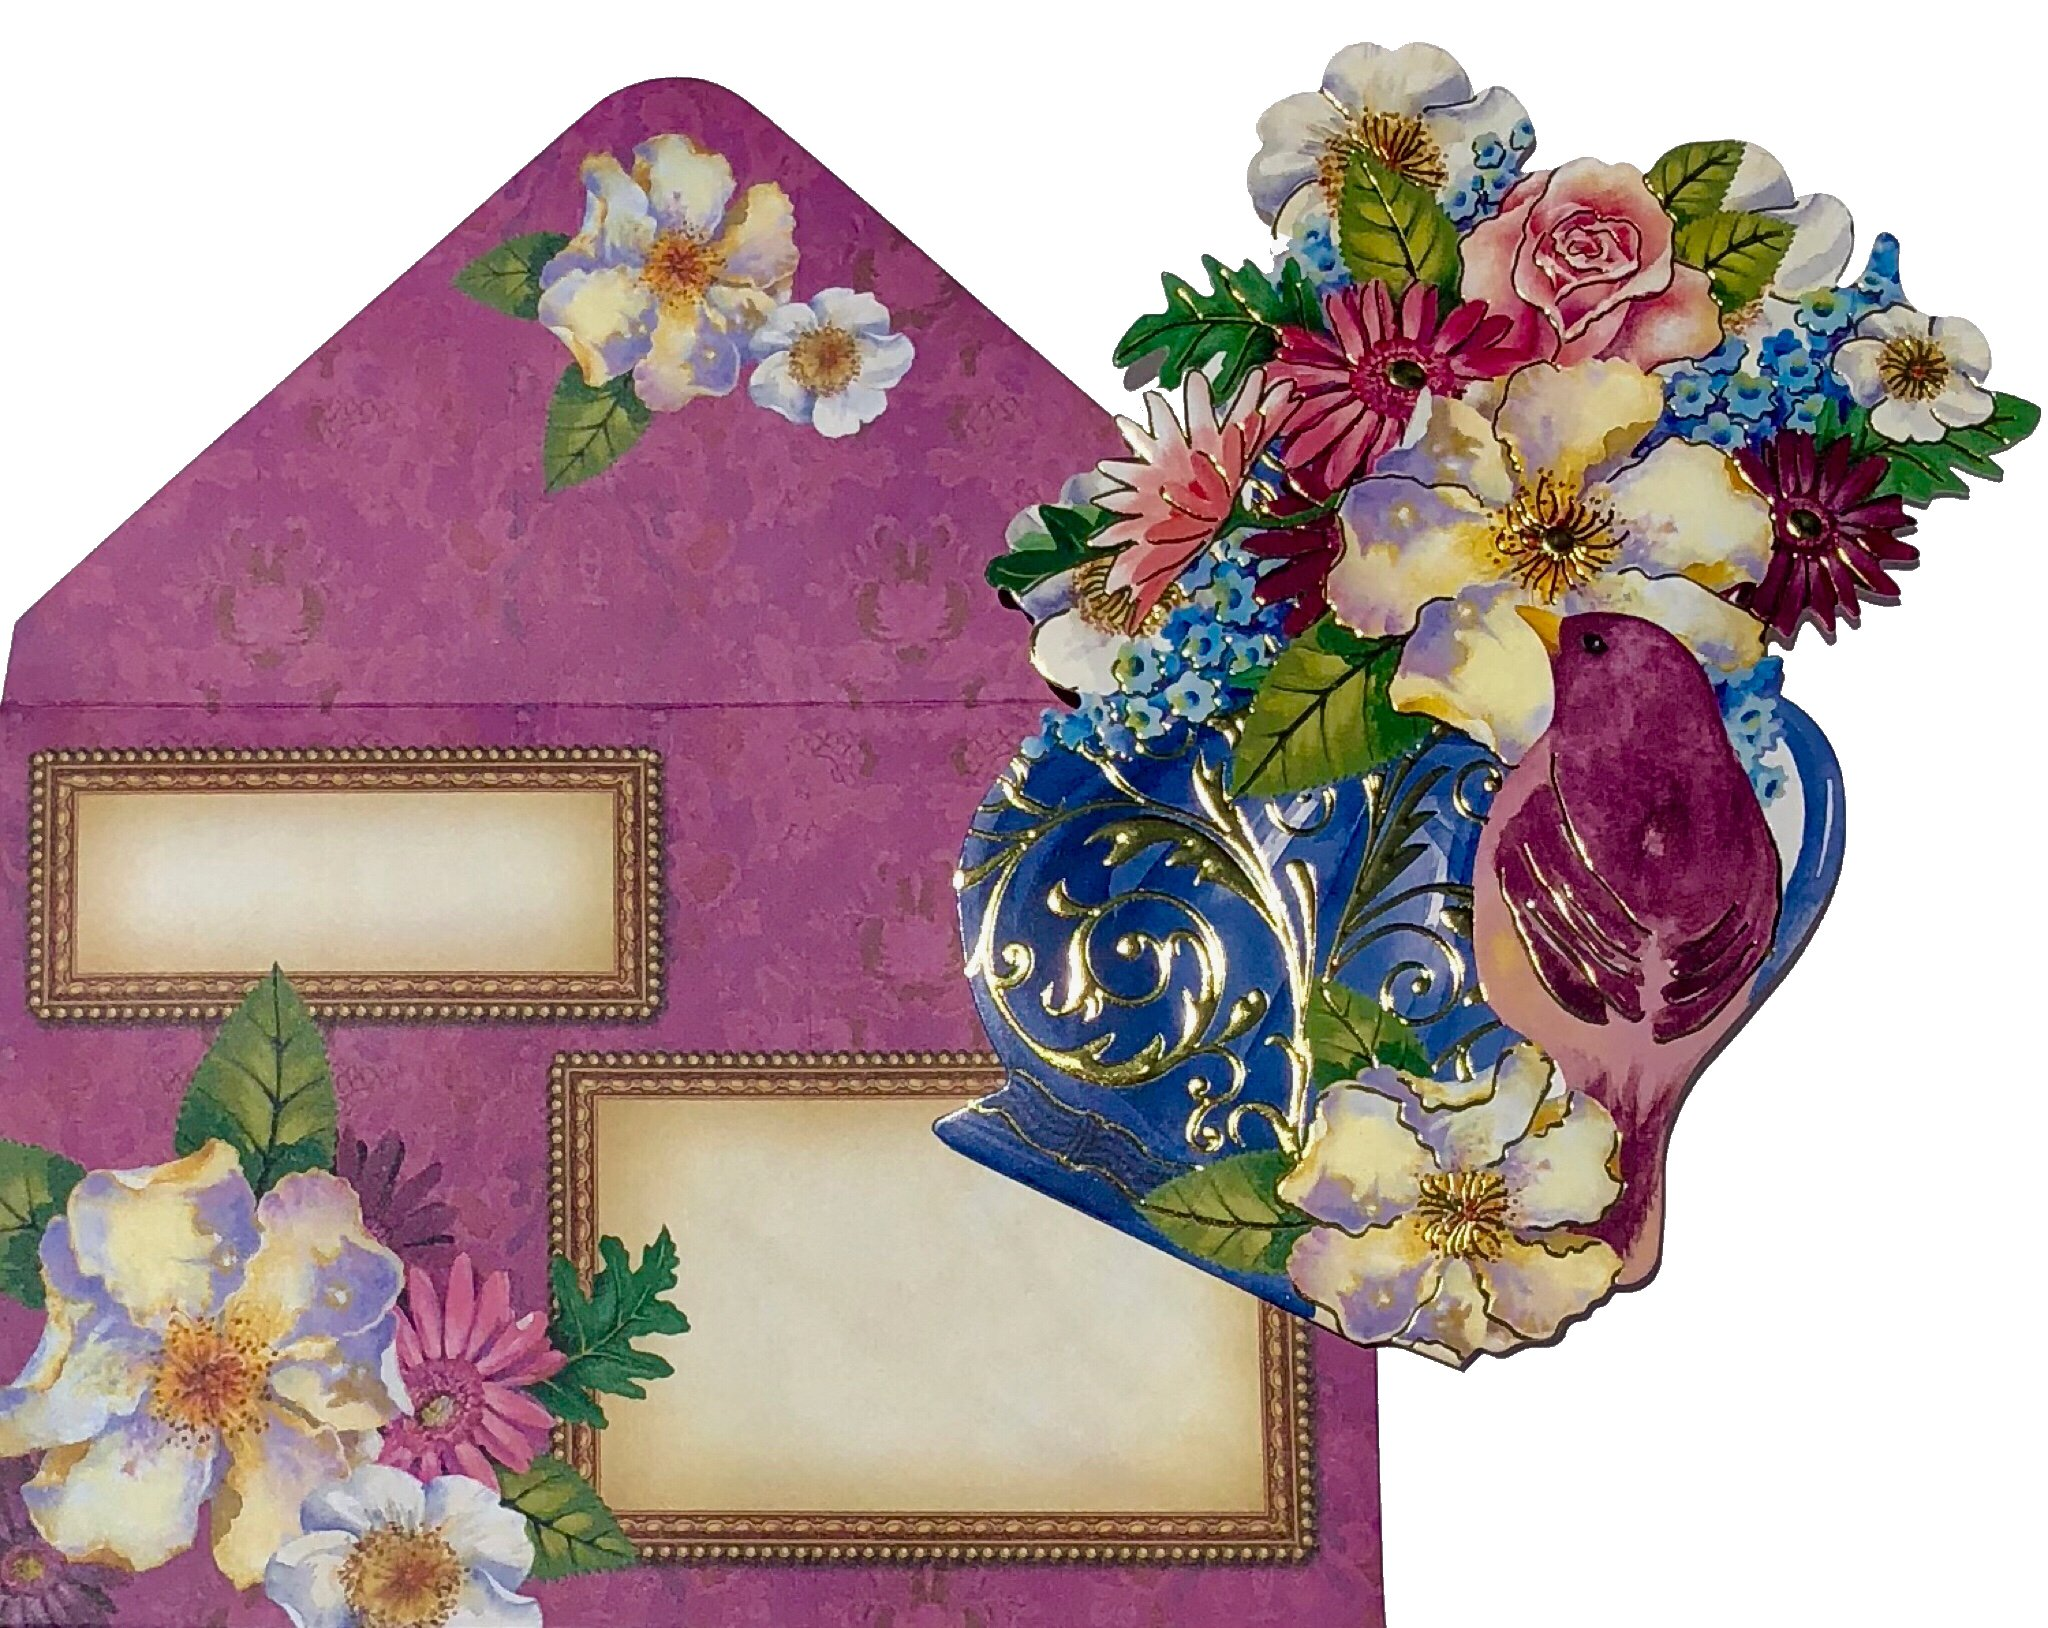 Punch Studio Set of 10 Gold Foil Embellished Die-Cut Fancy Note Cards ~ Birds Bouquet 64537